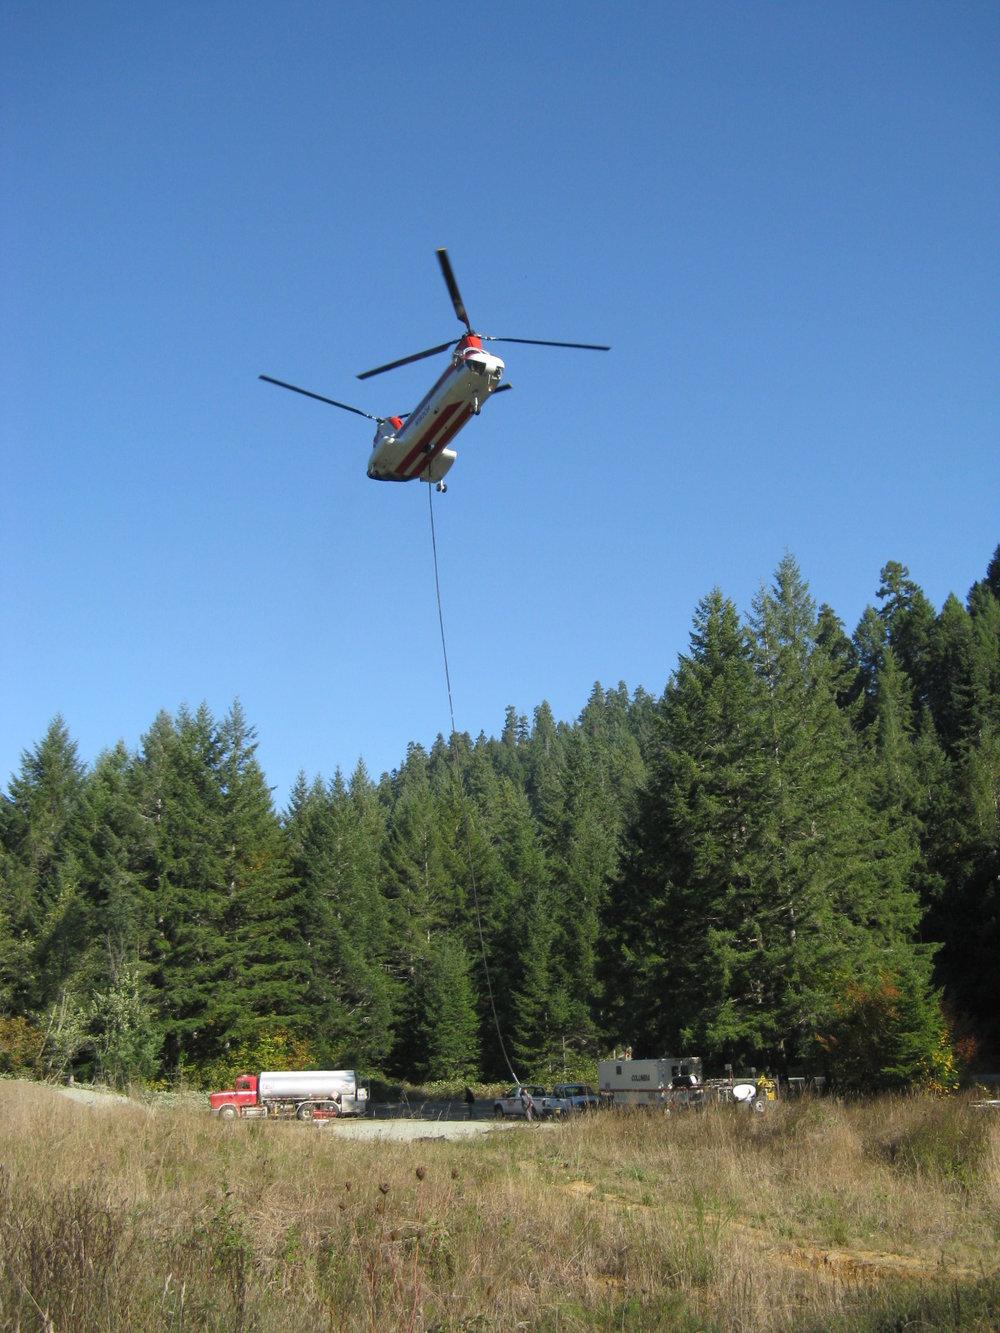 heli at landing.jpg